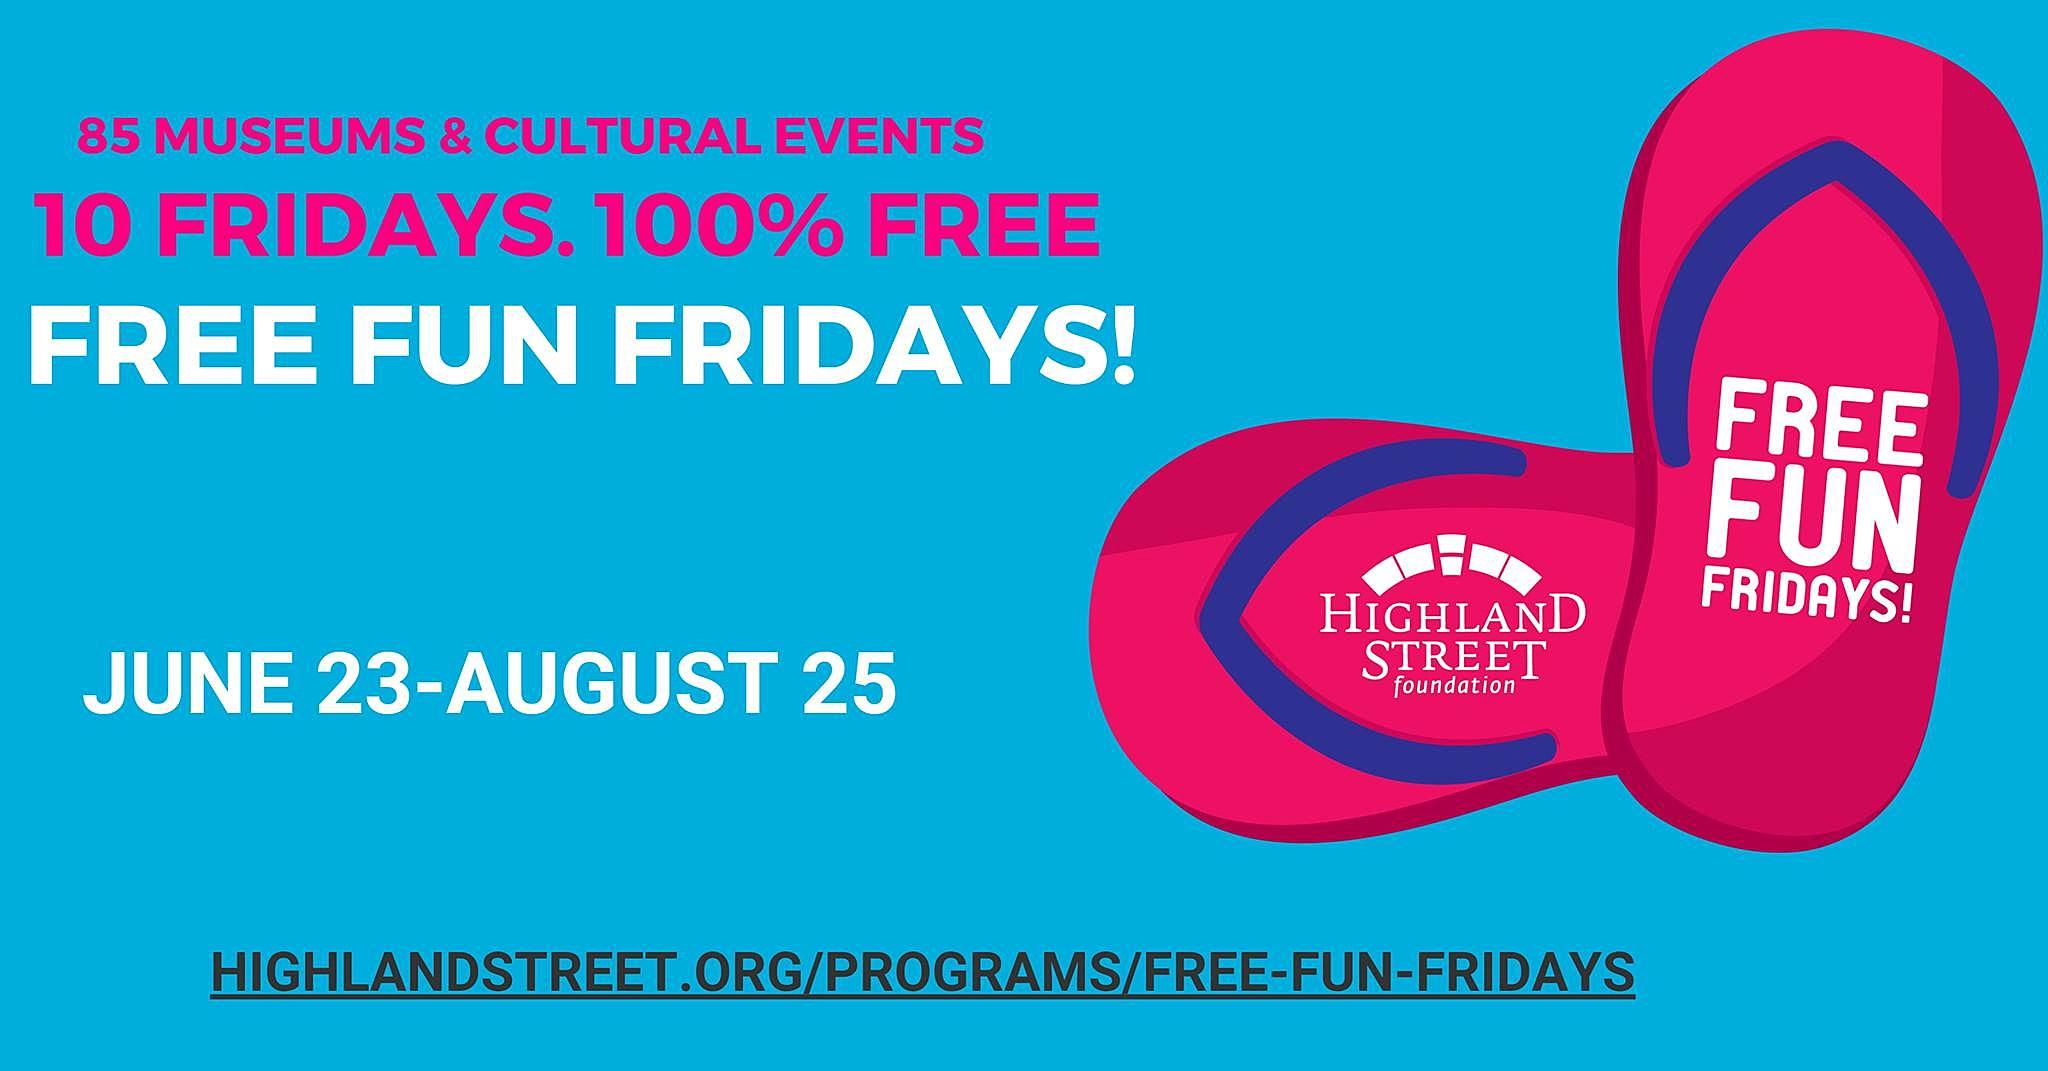 Highland Street Foundation / Facebook